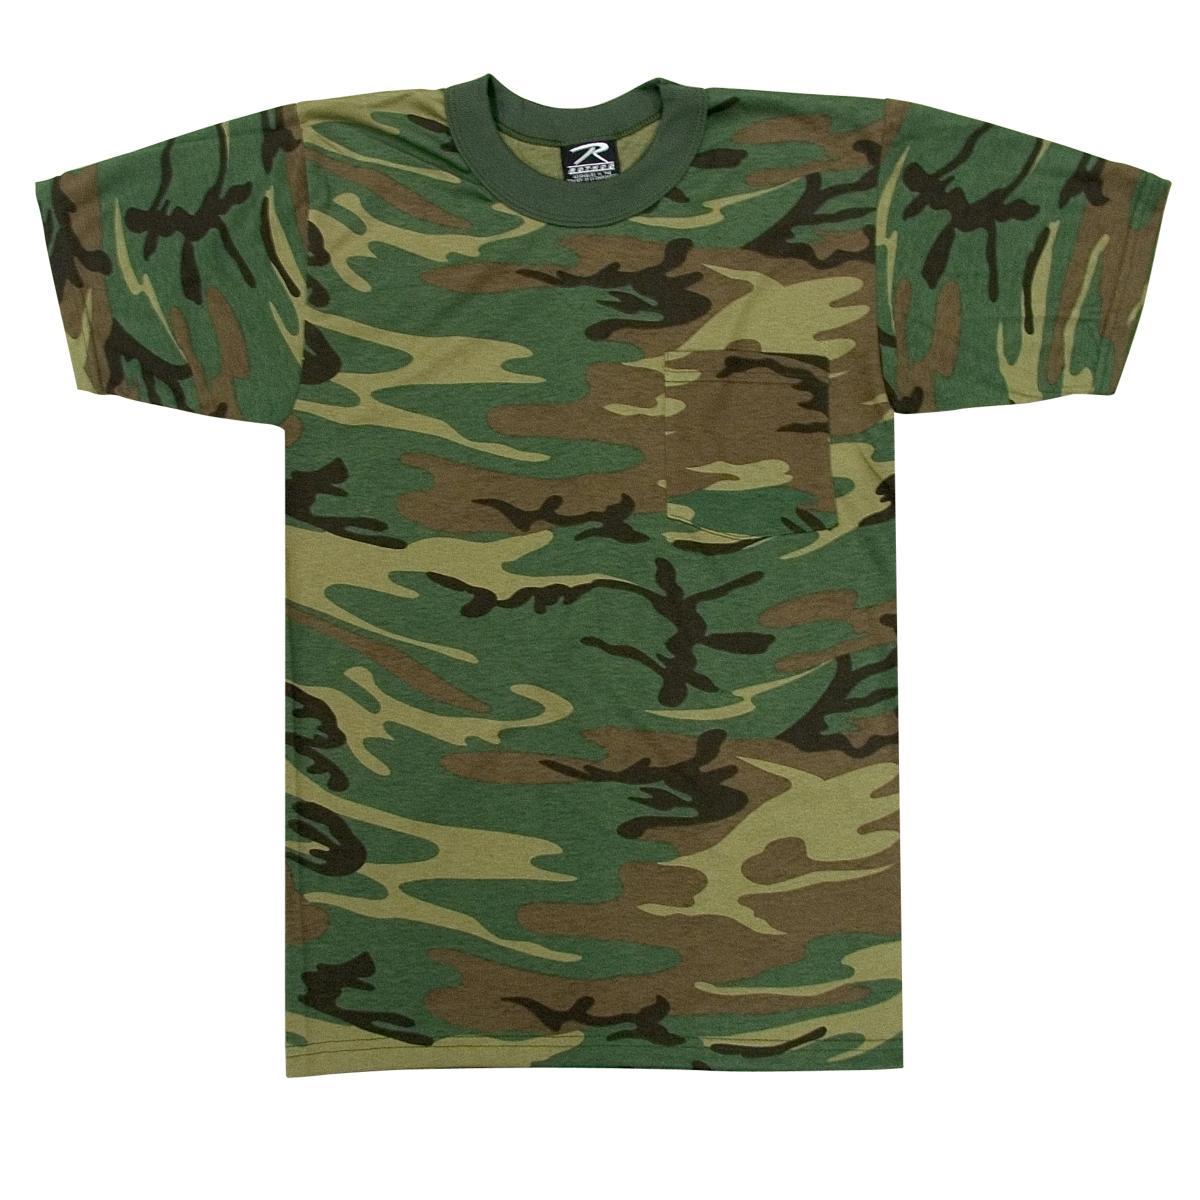 Woodland Camouflage T-Shirt with Pocket